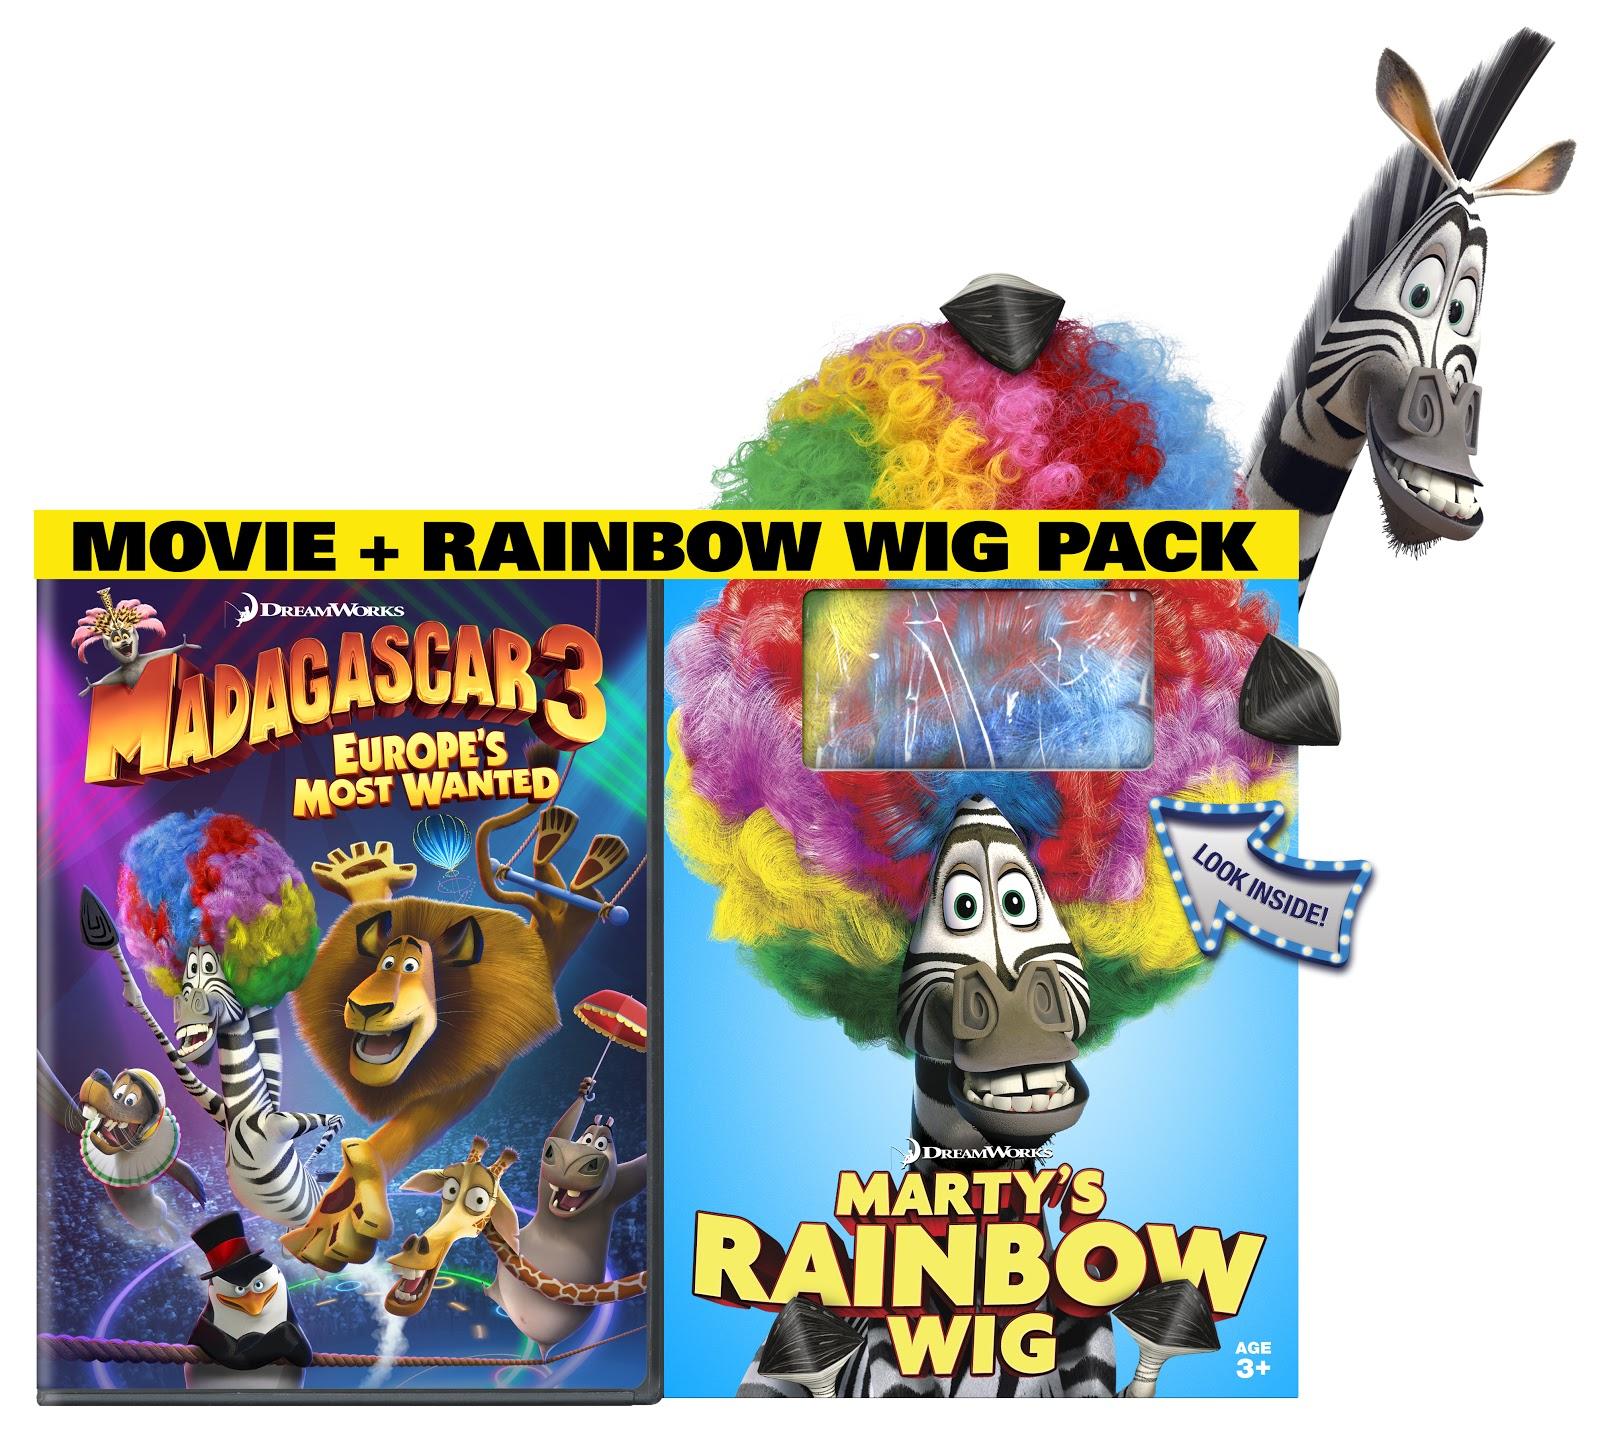 Madagascar 3 Europe Most Wanted Soundtrack – Name